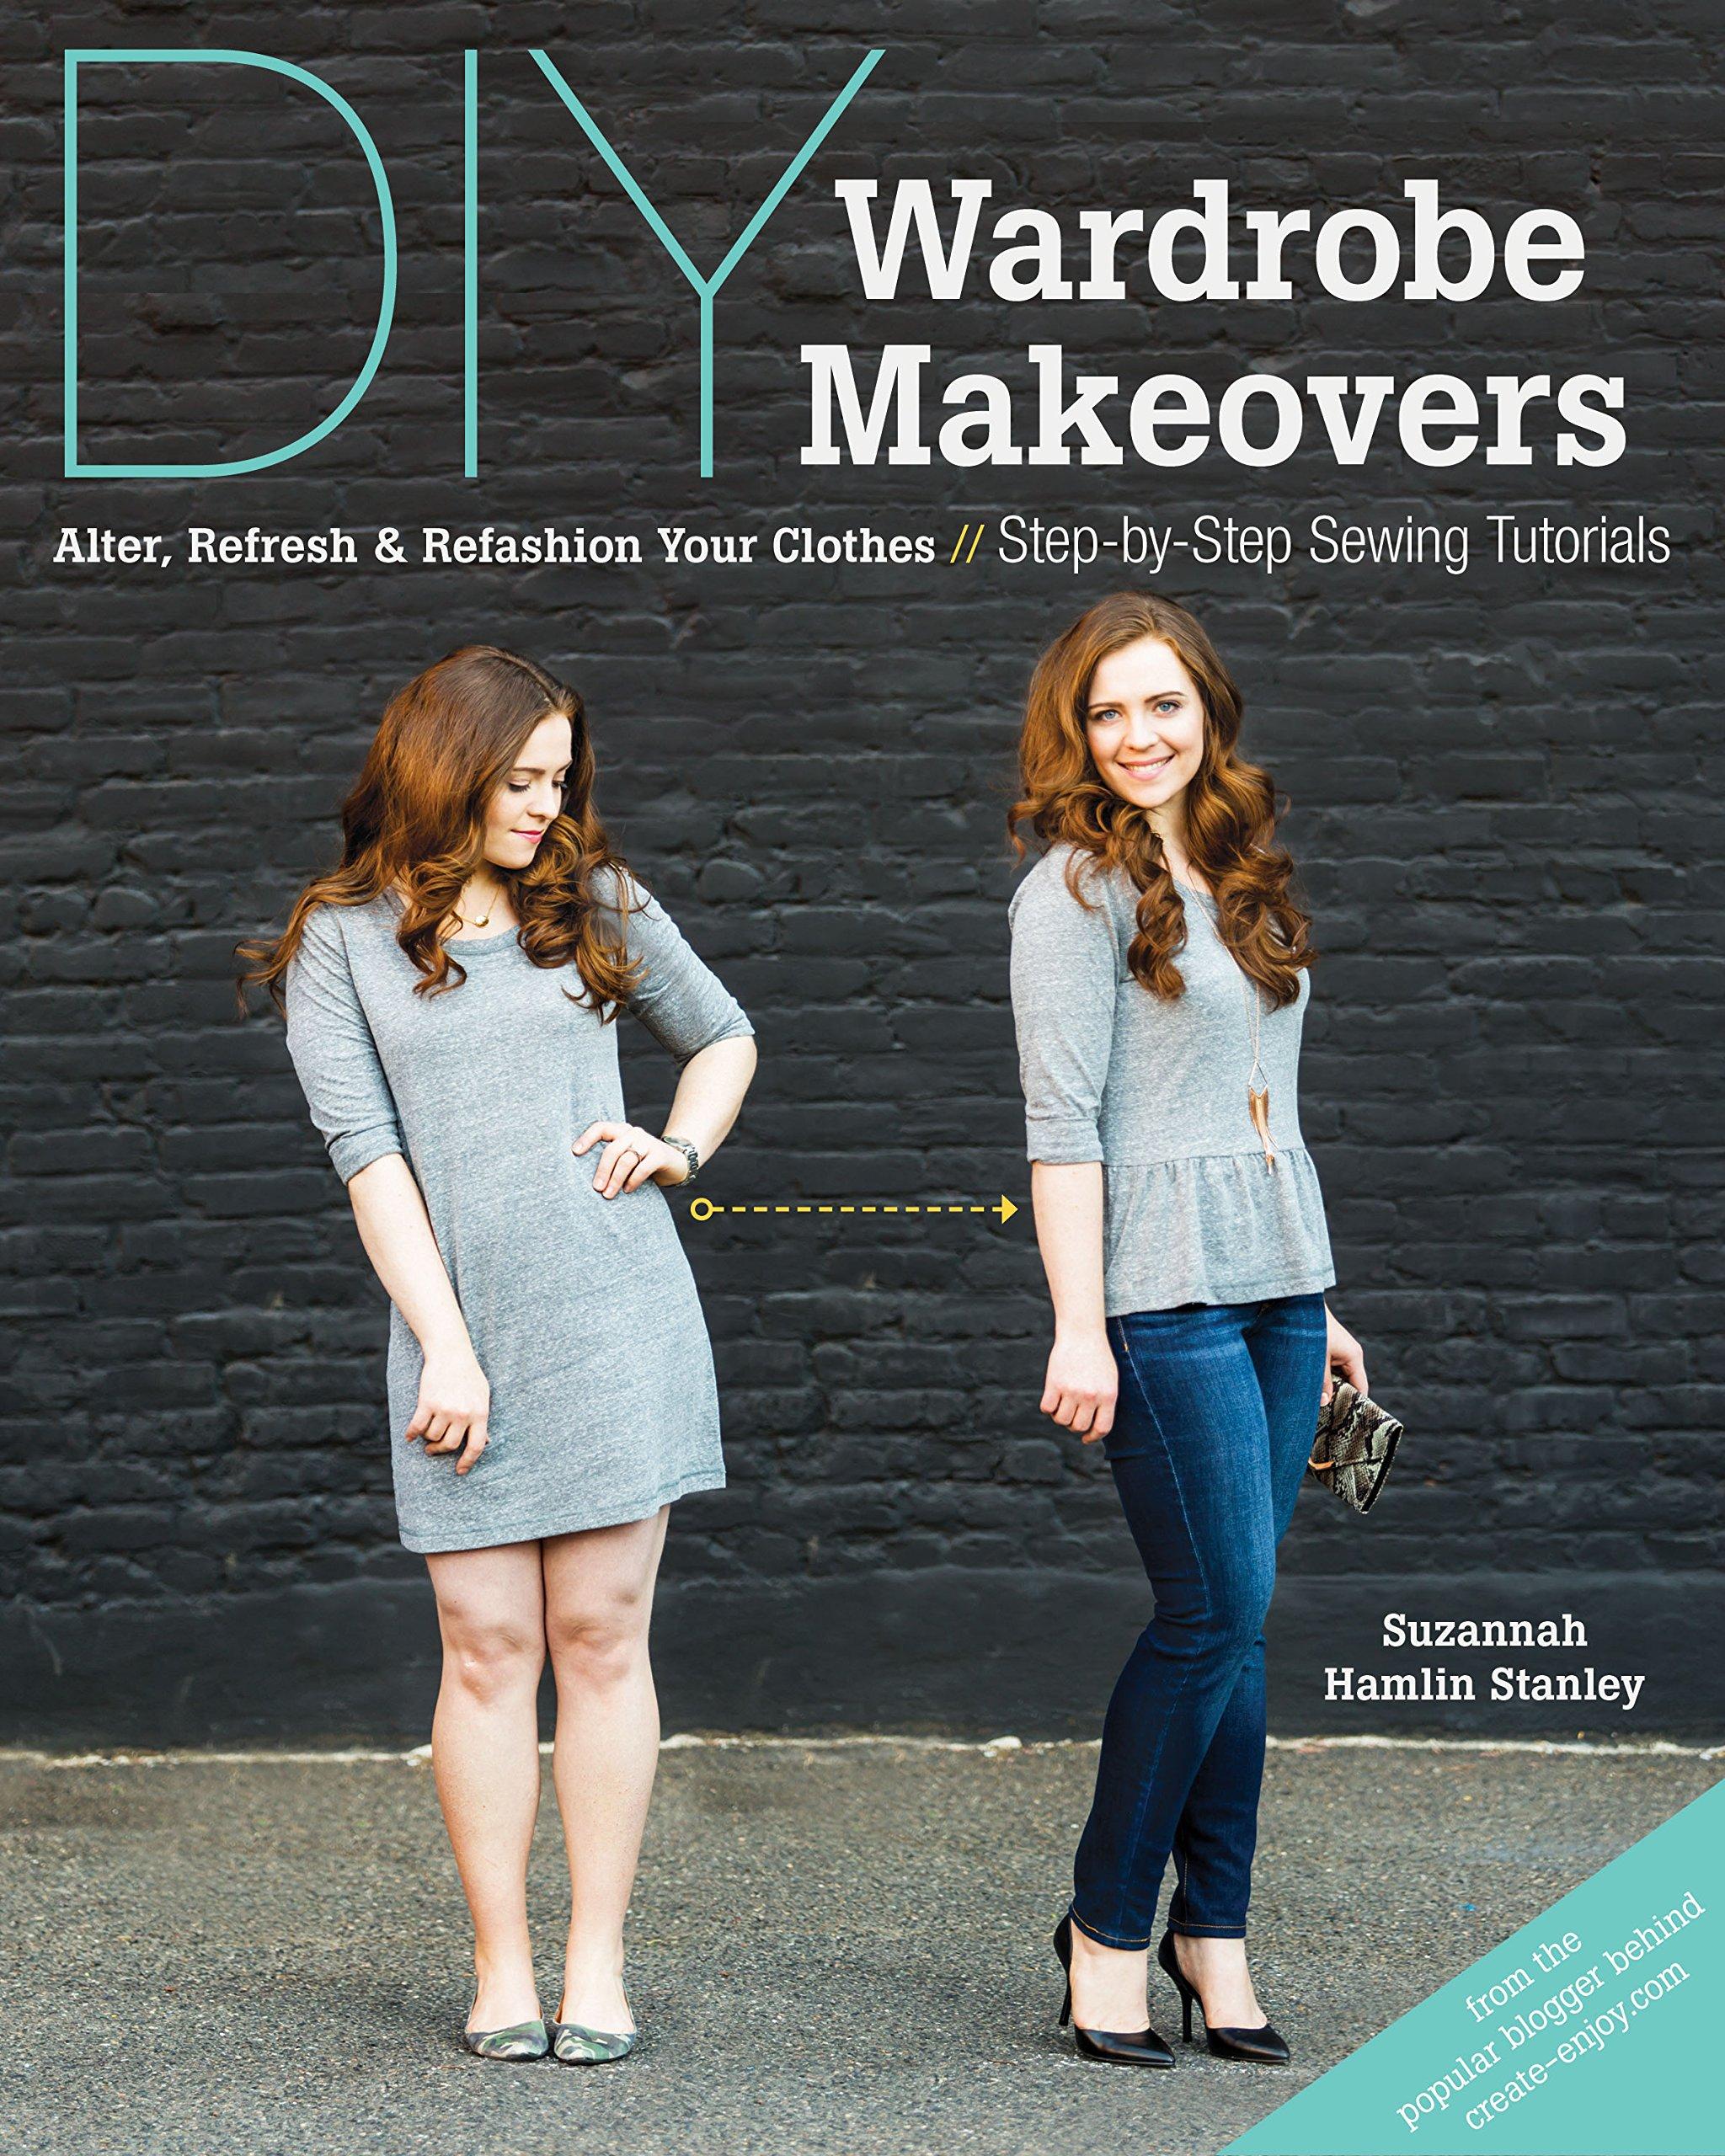 DIY Wardrobe Makeovers: Alter, Refresh & Refashion Your